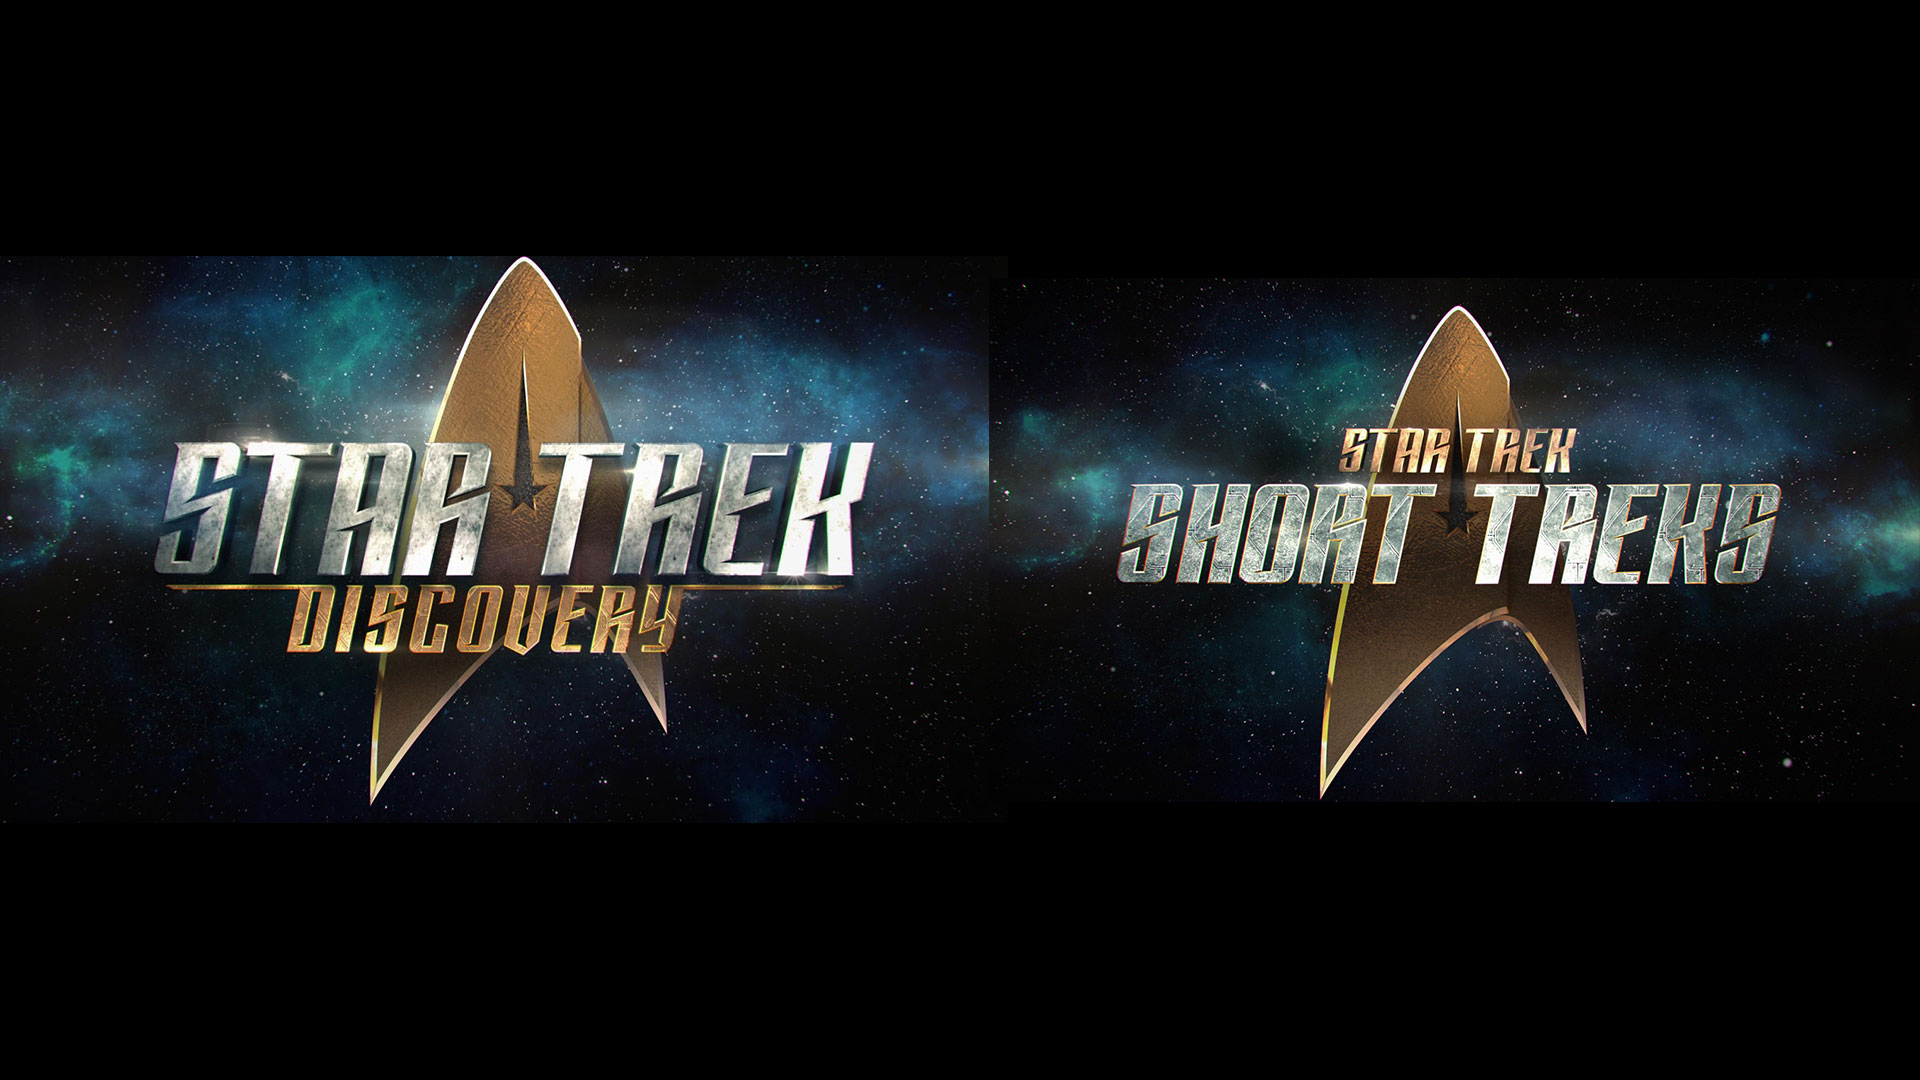 Star Trek: Discovery And Star Trek: Short Treks Break News At SDCC 2019